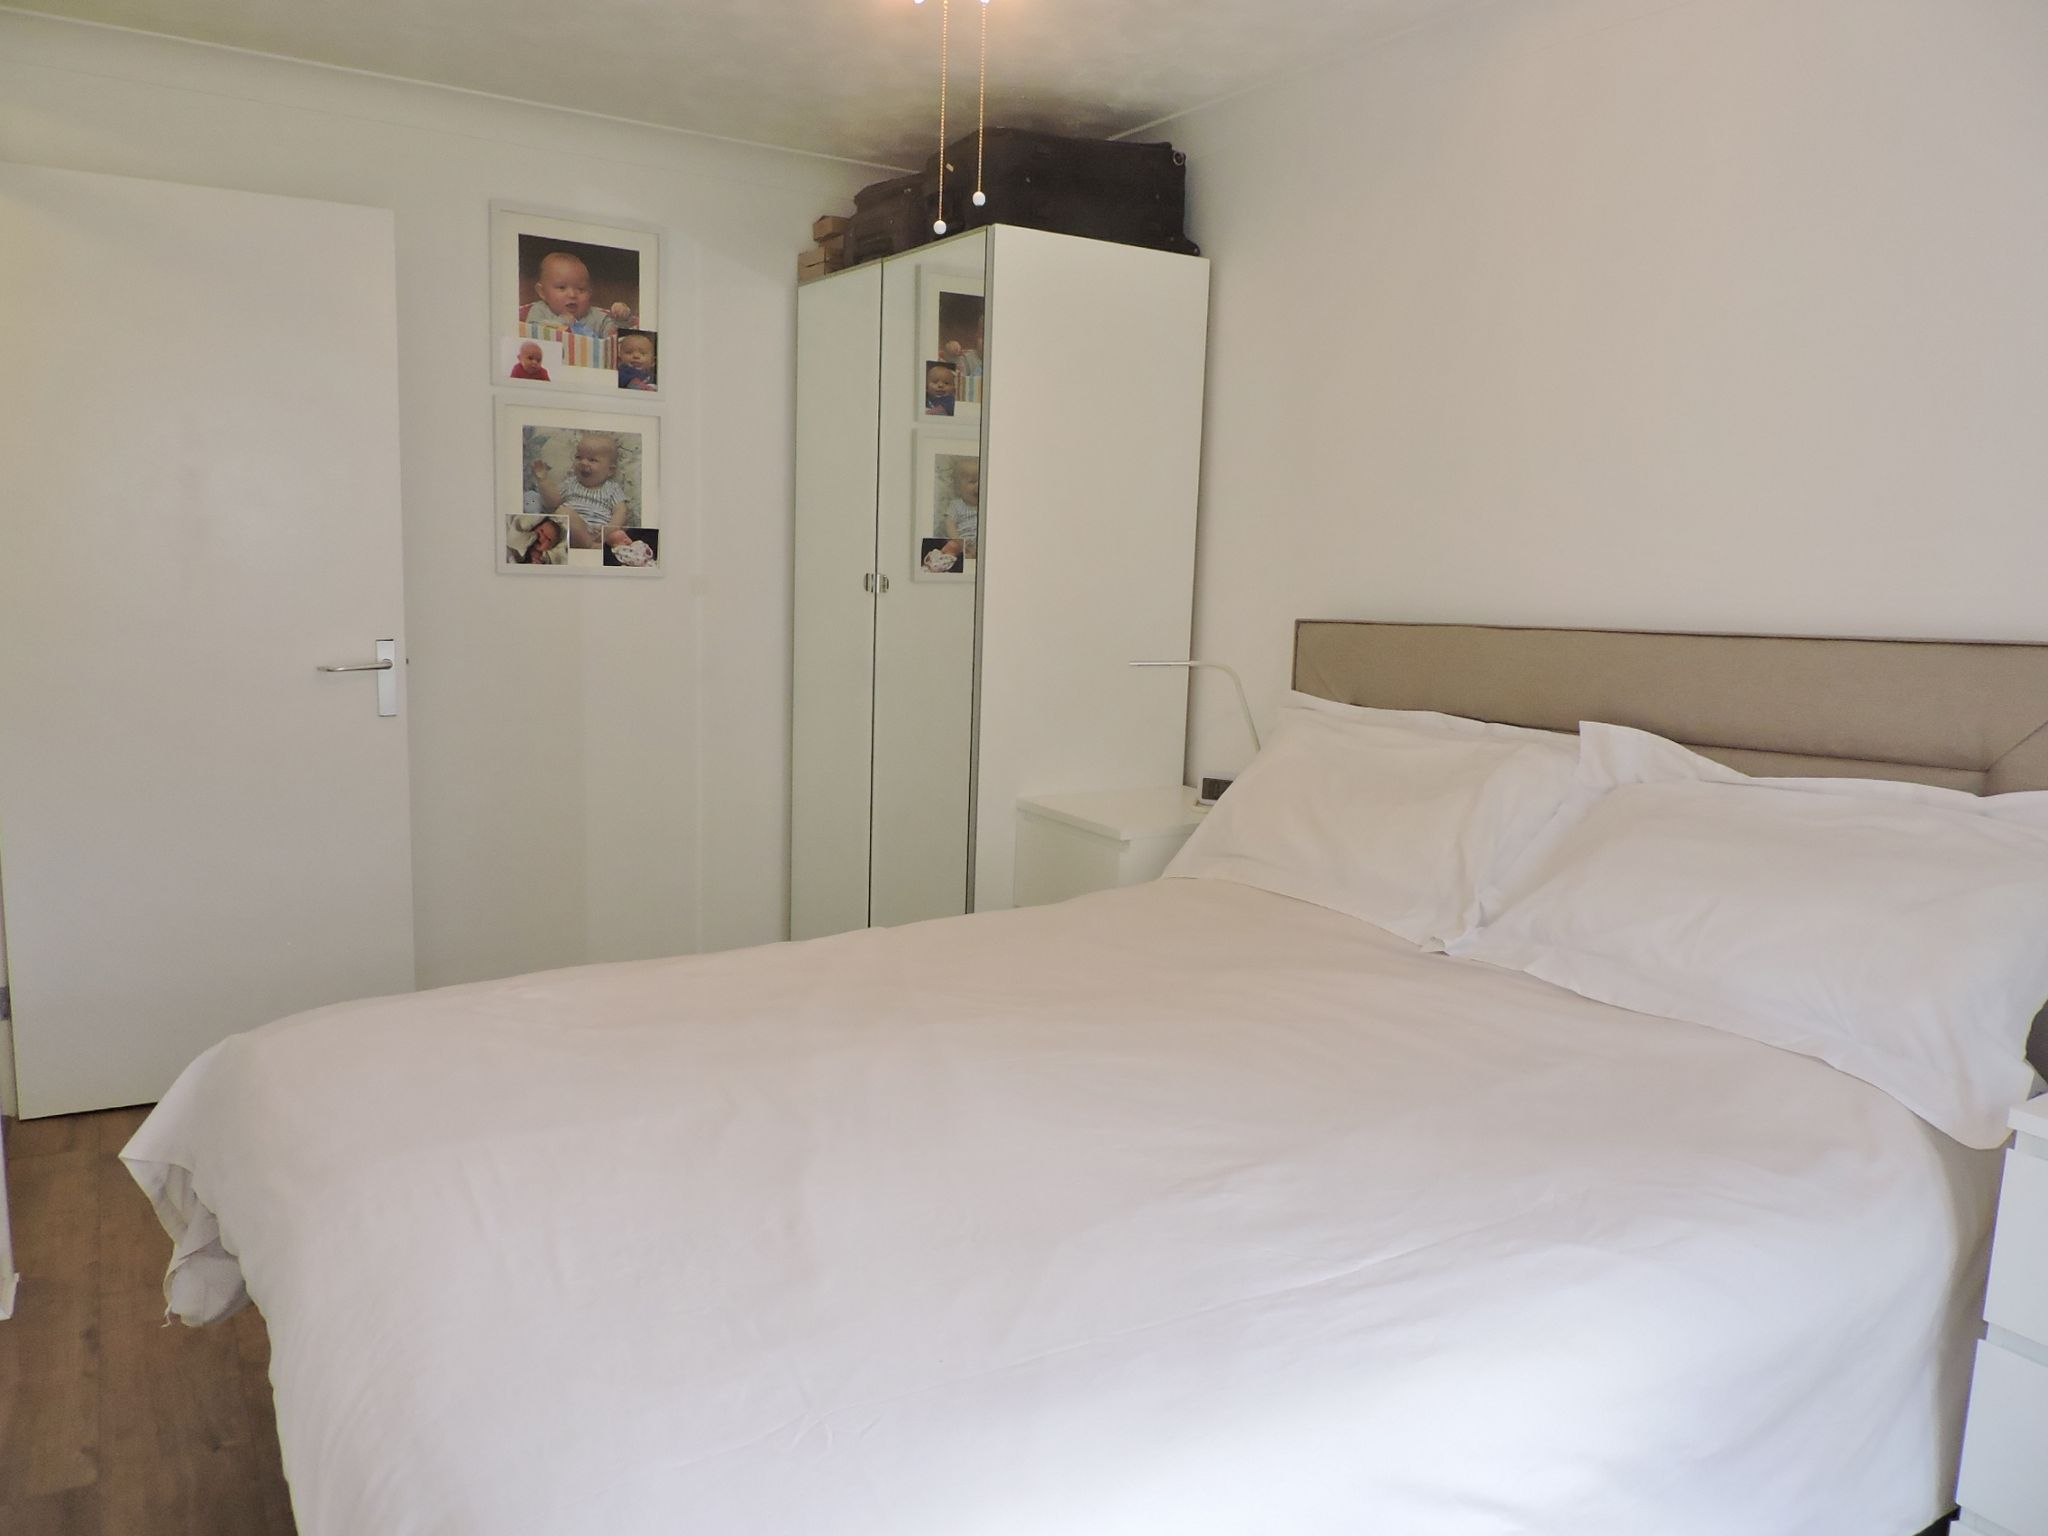 1 bedroom ground floor maisonette flat/apartment Sale Agreed in New Malden - Photograph 7